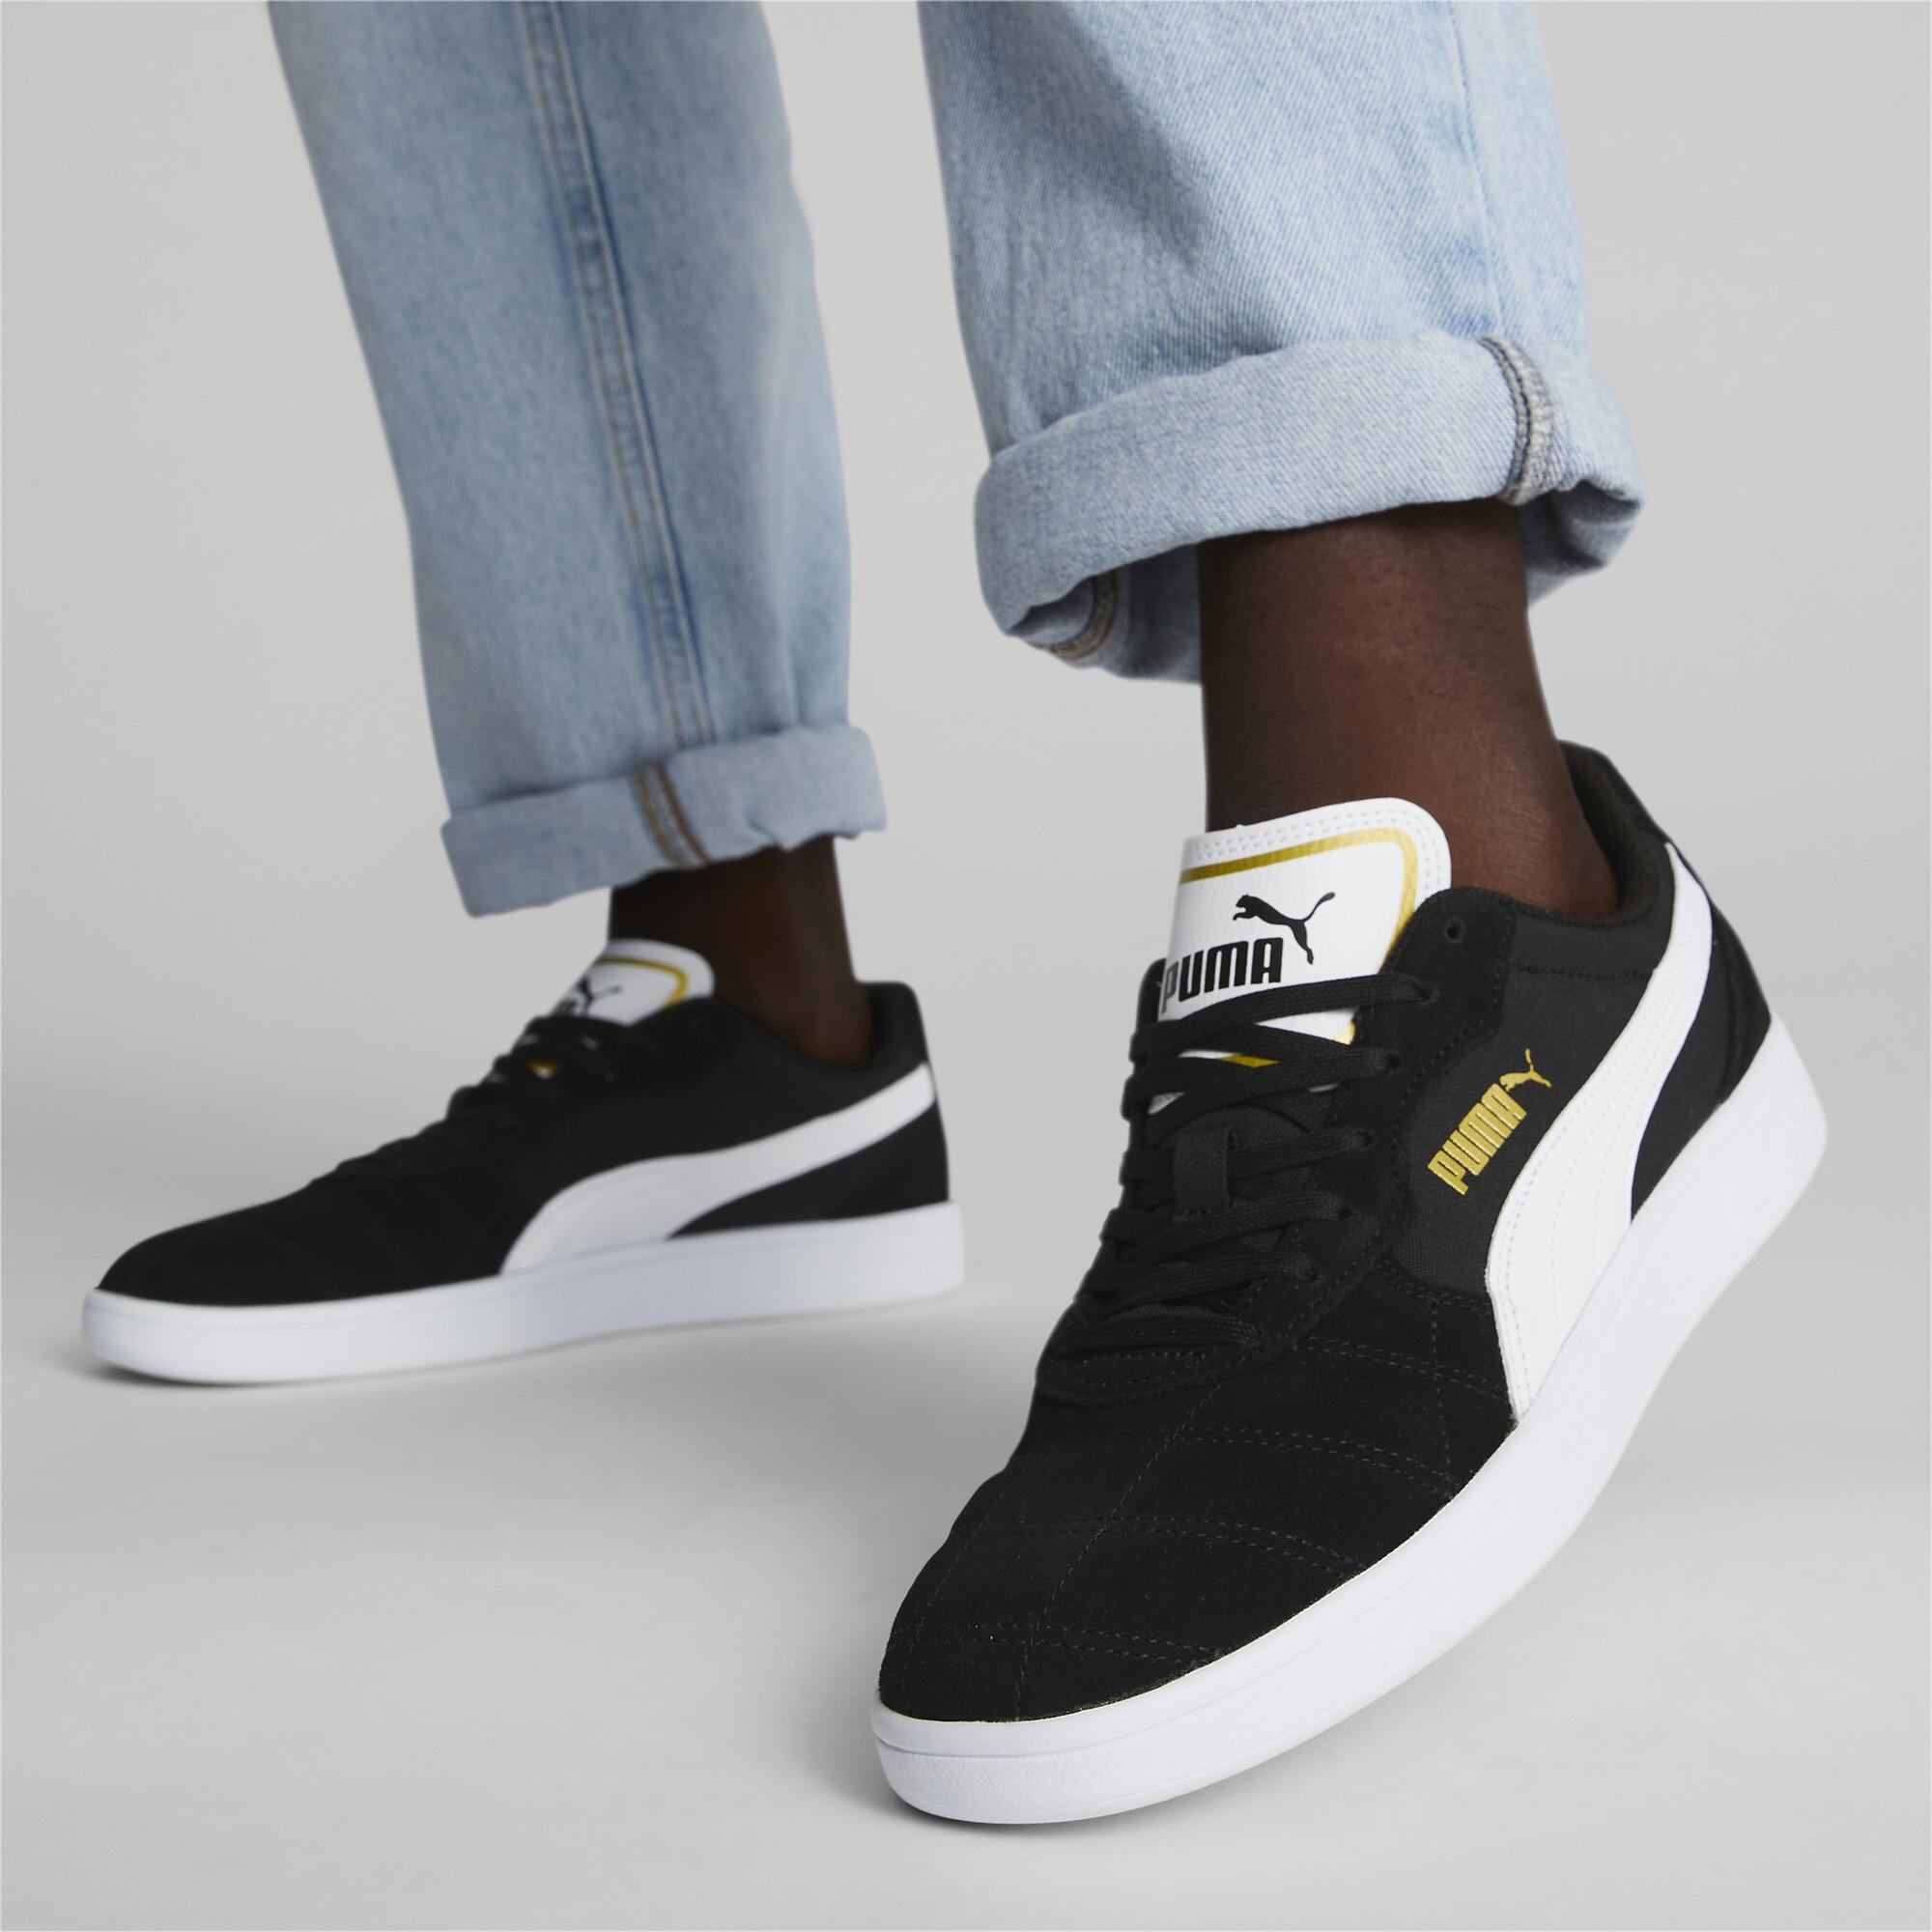 PUMA-Men-039-s-Astro-Kick-Sneakers thumbnail 27